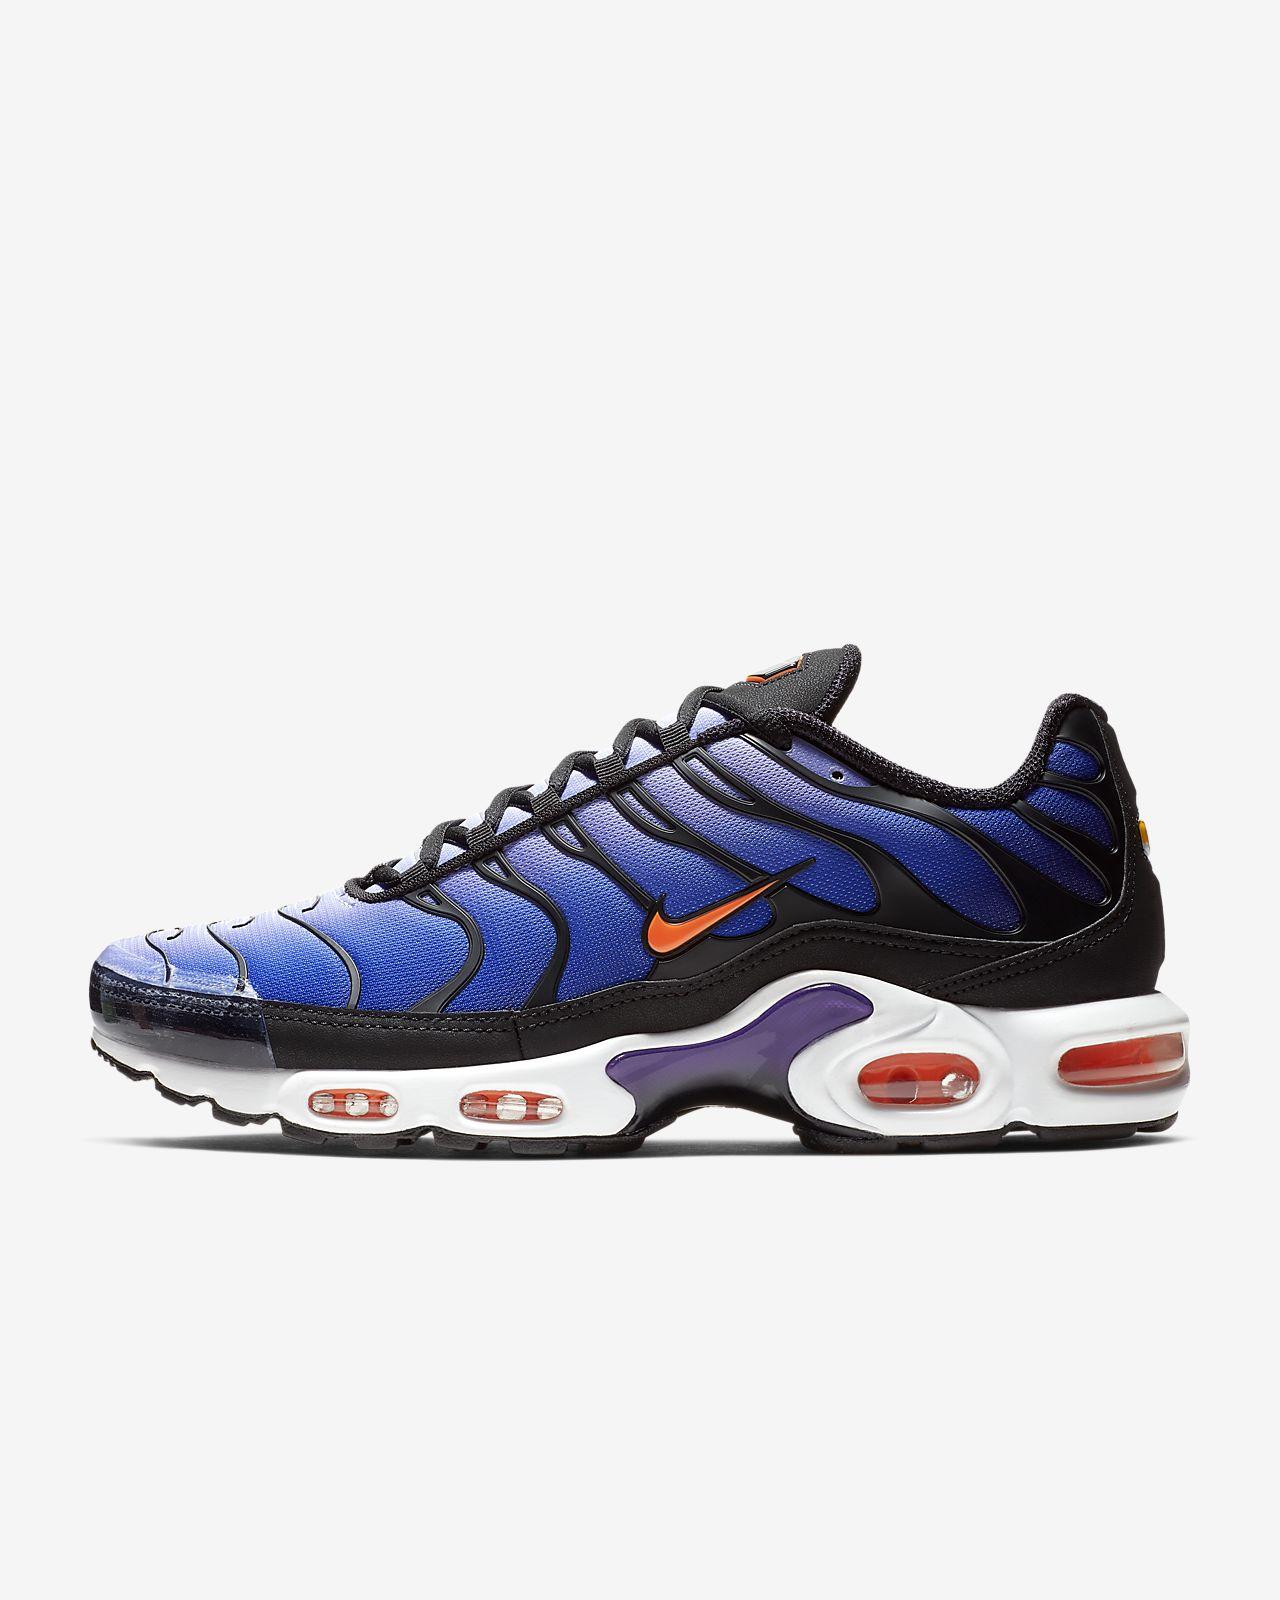 san francisco cba05 fdedd ... Nike Air Max Plus OG Shoe